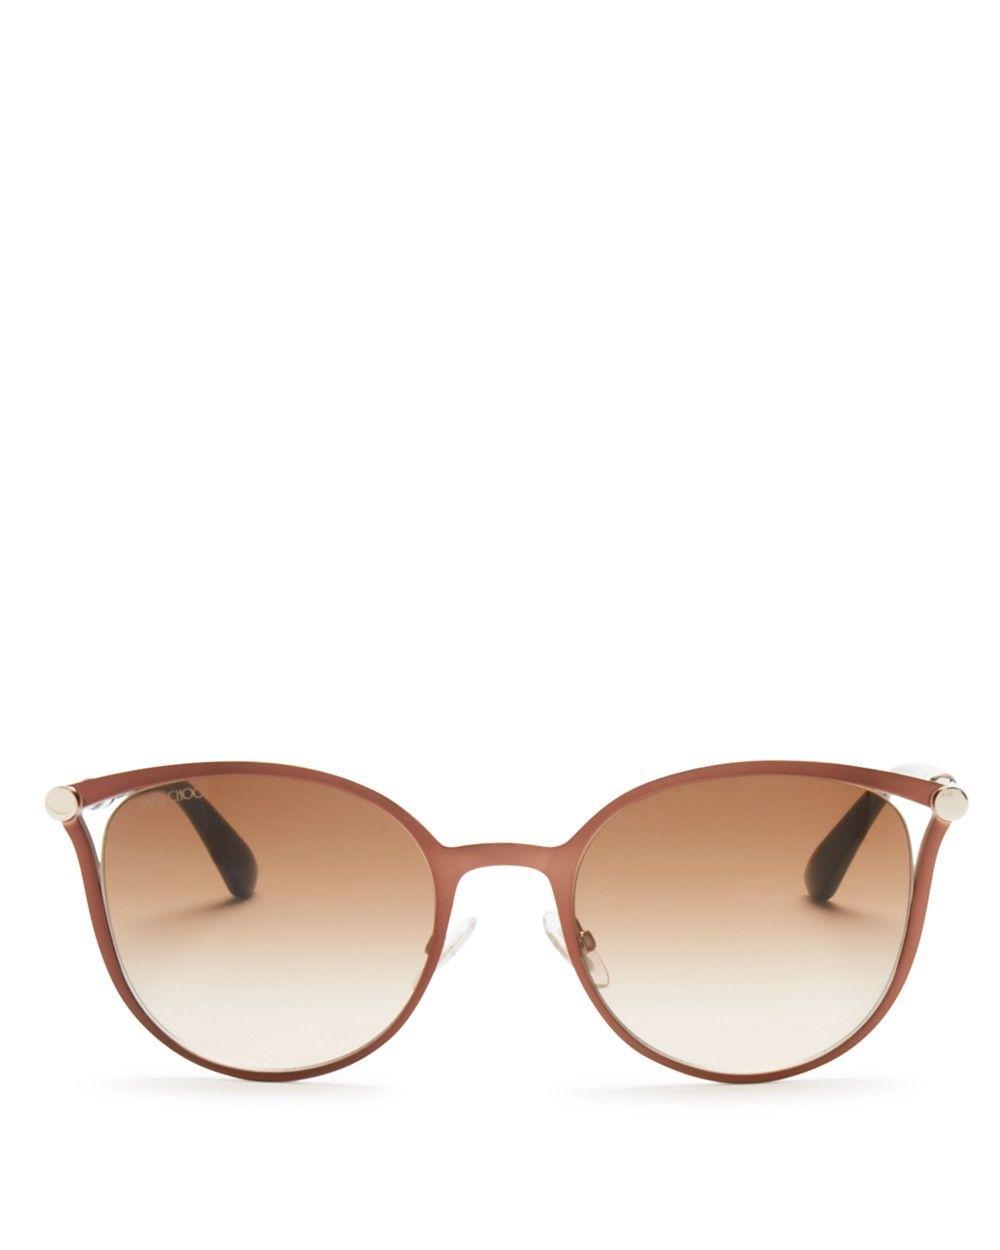 c82bd3e4209 JIMMY CHOO Jimmy Choo Neiza Cat Eye Sunglasses